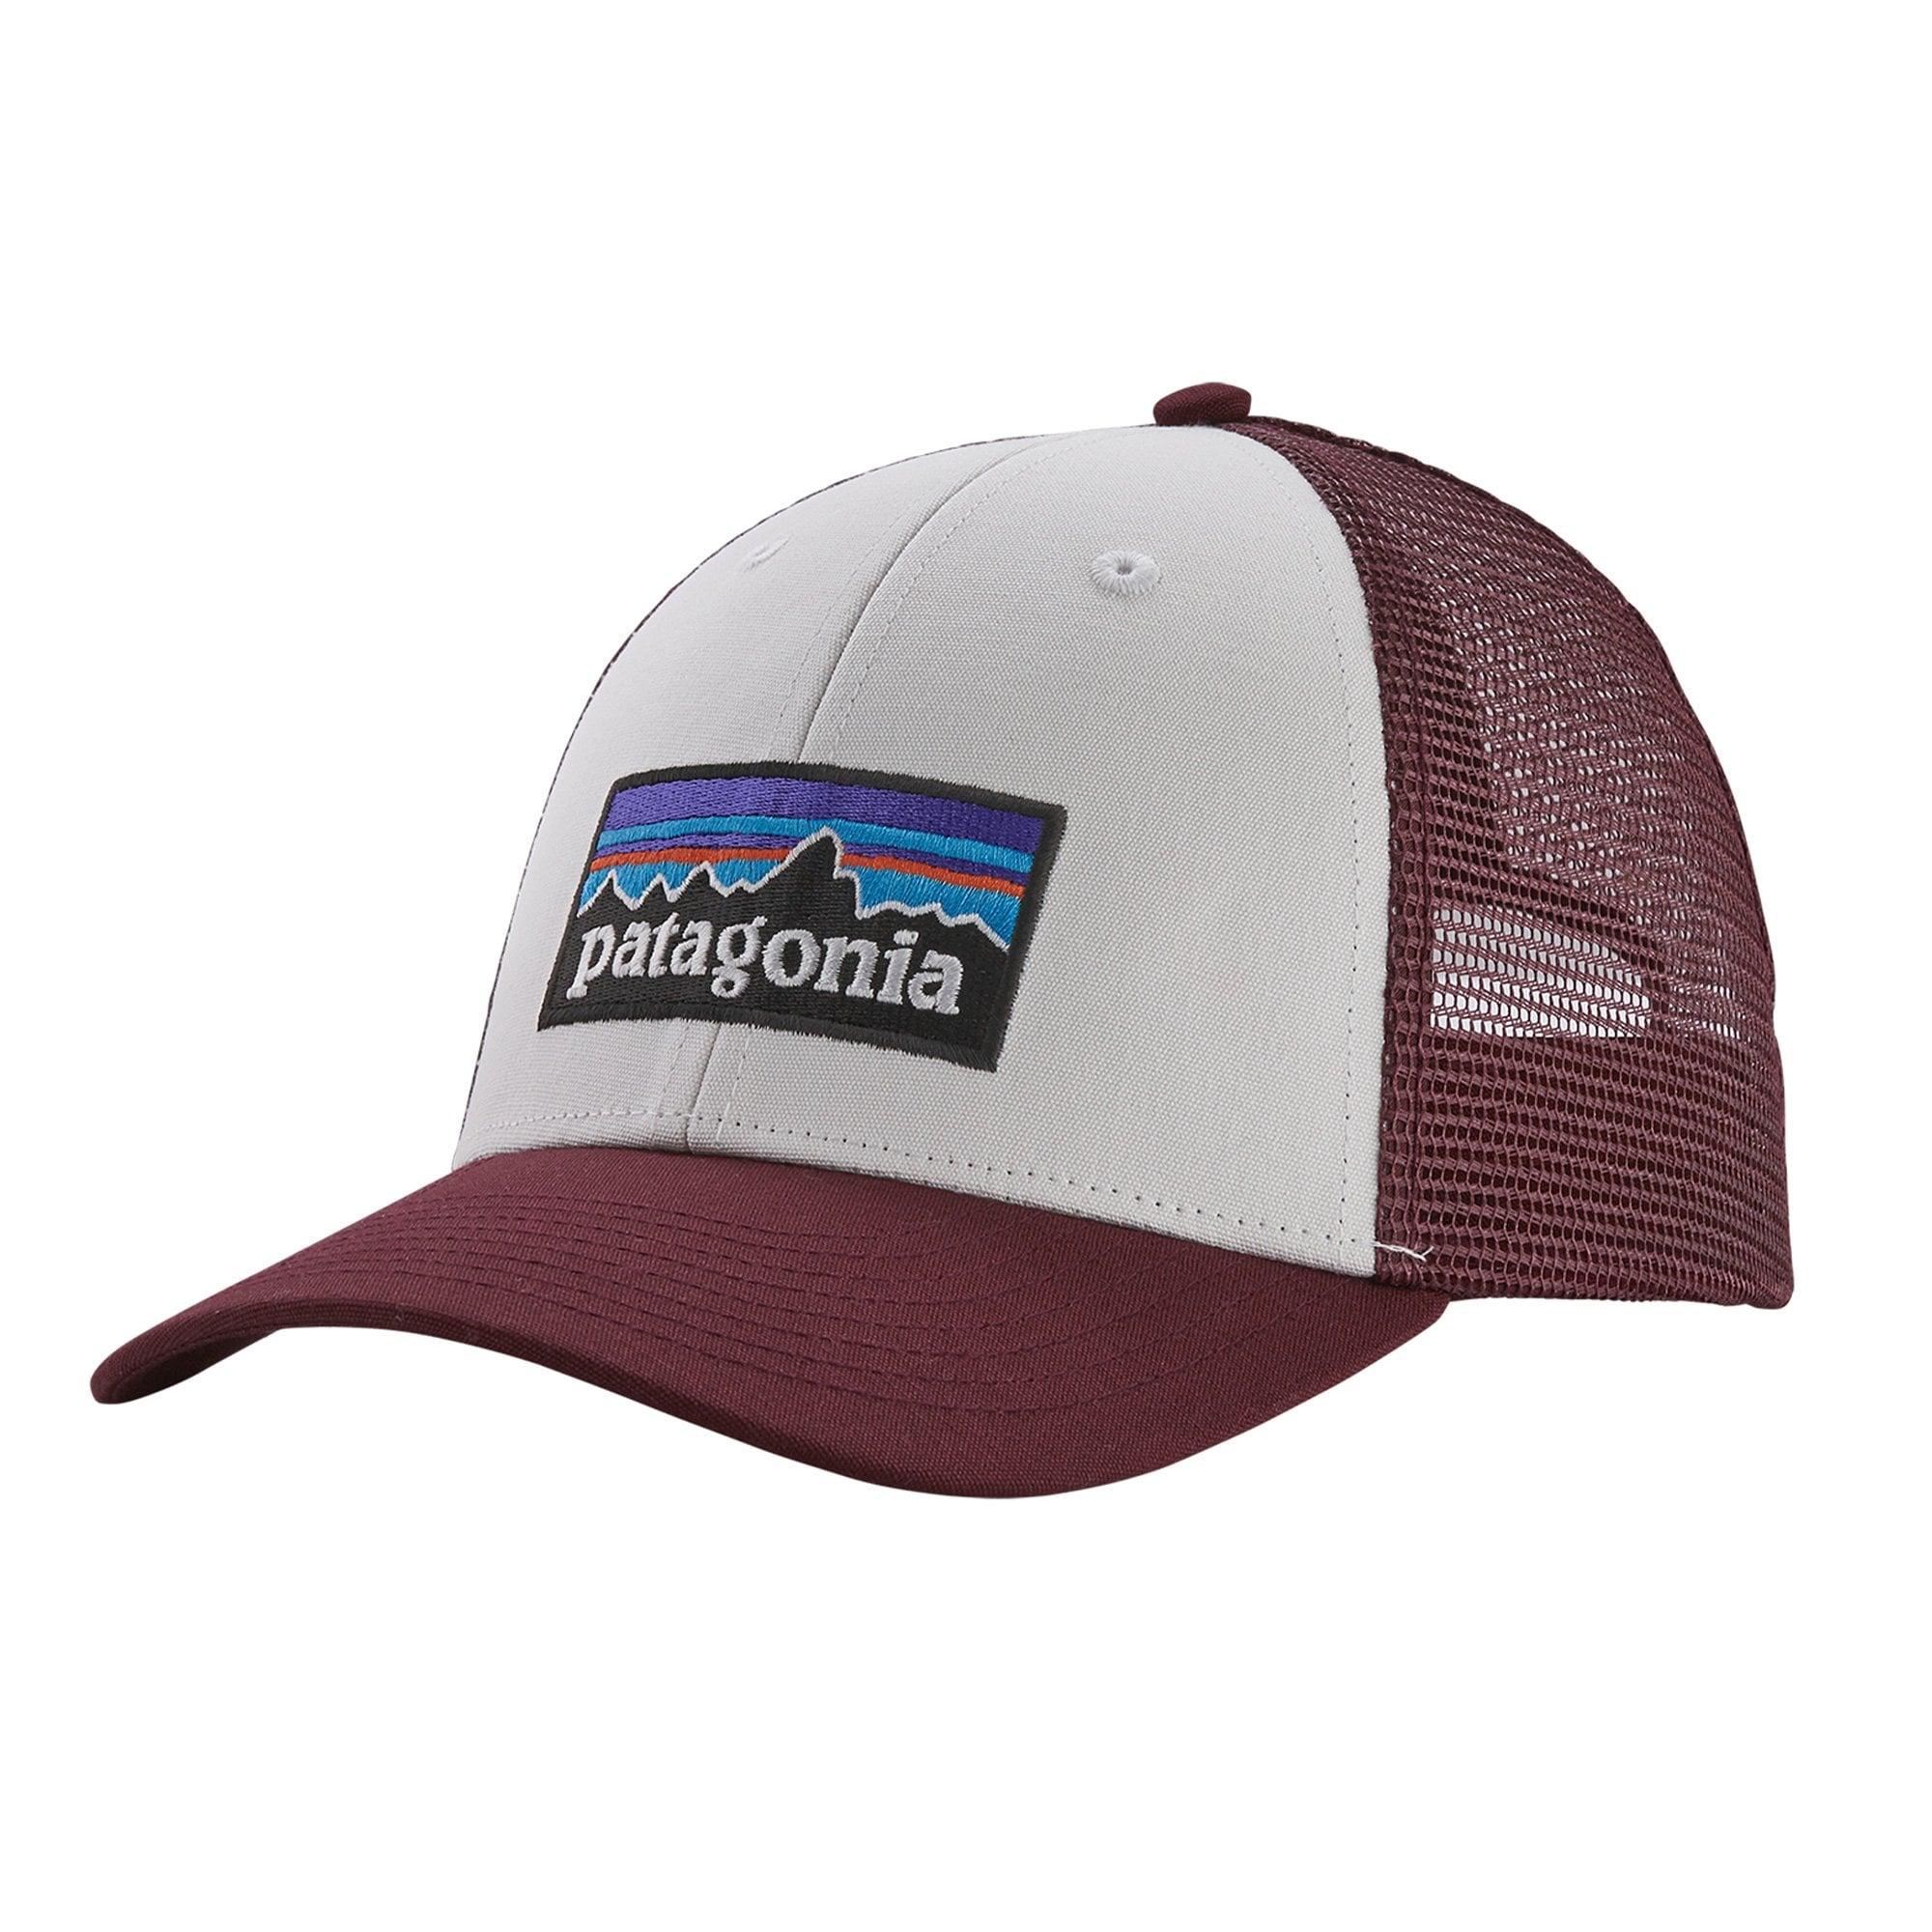 patagonia-p-6-logo-lopro-trucker-hat-white-dark-ruby-p16799-22764_zoom.jpg